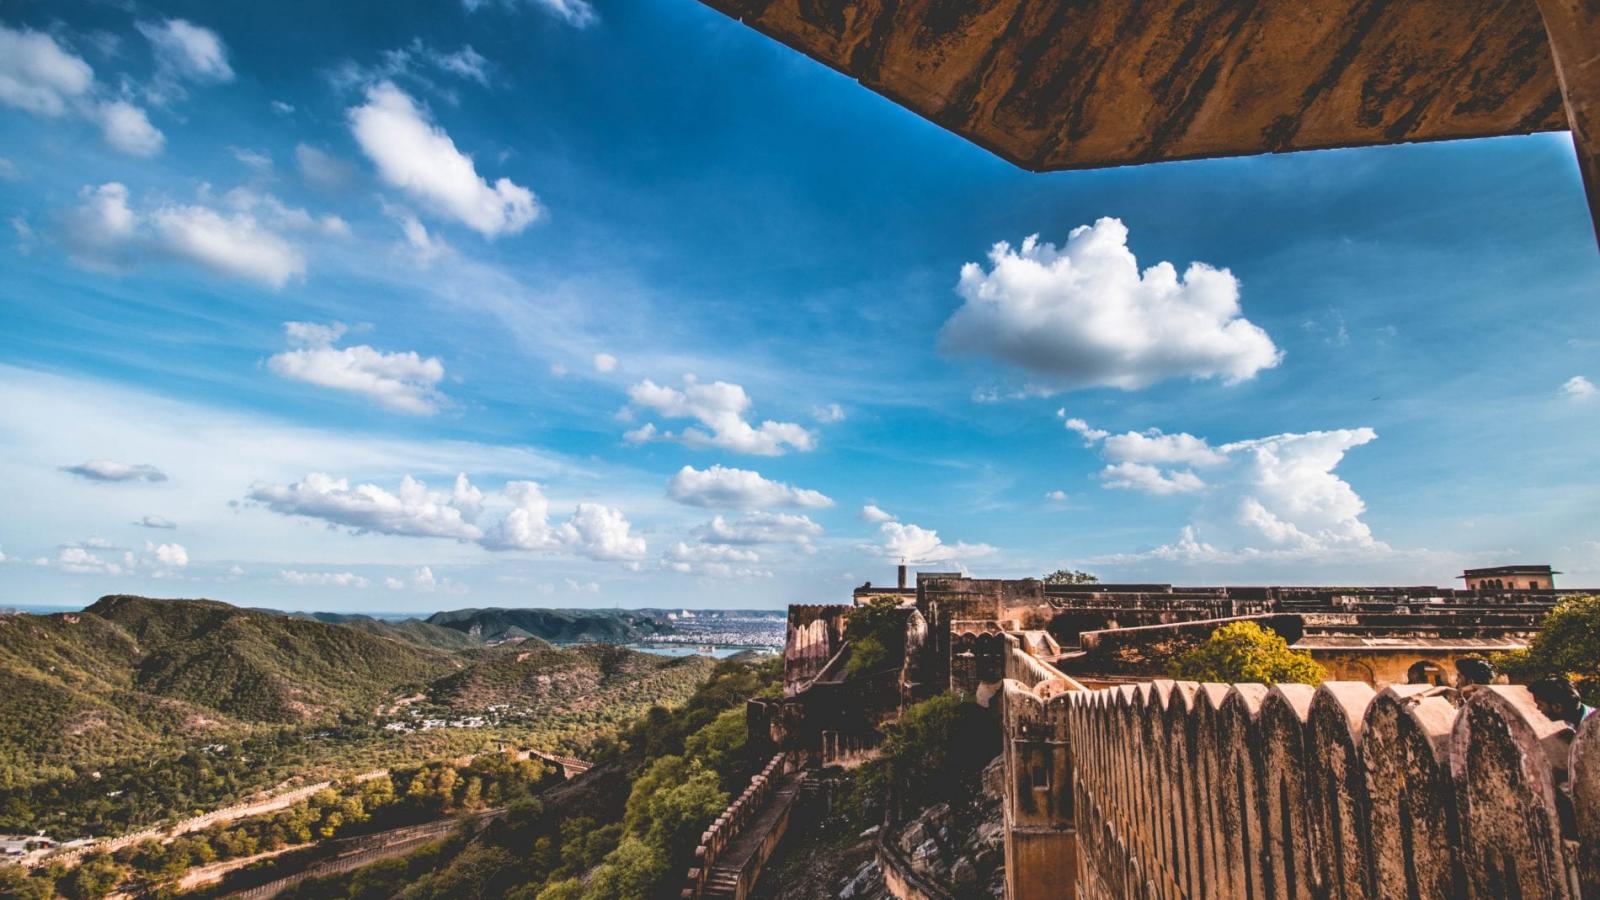 jaipur-jai-garh-amer-fort-view